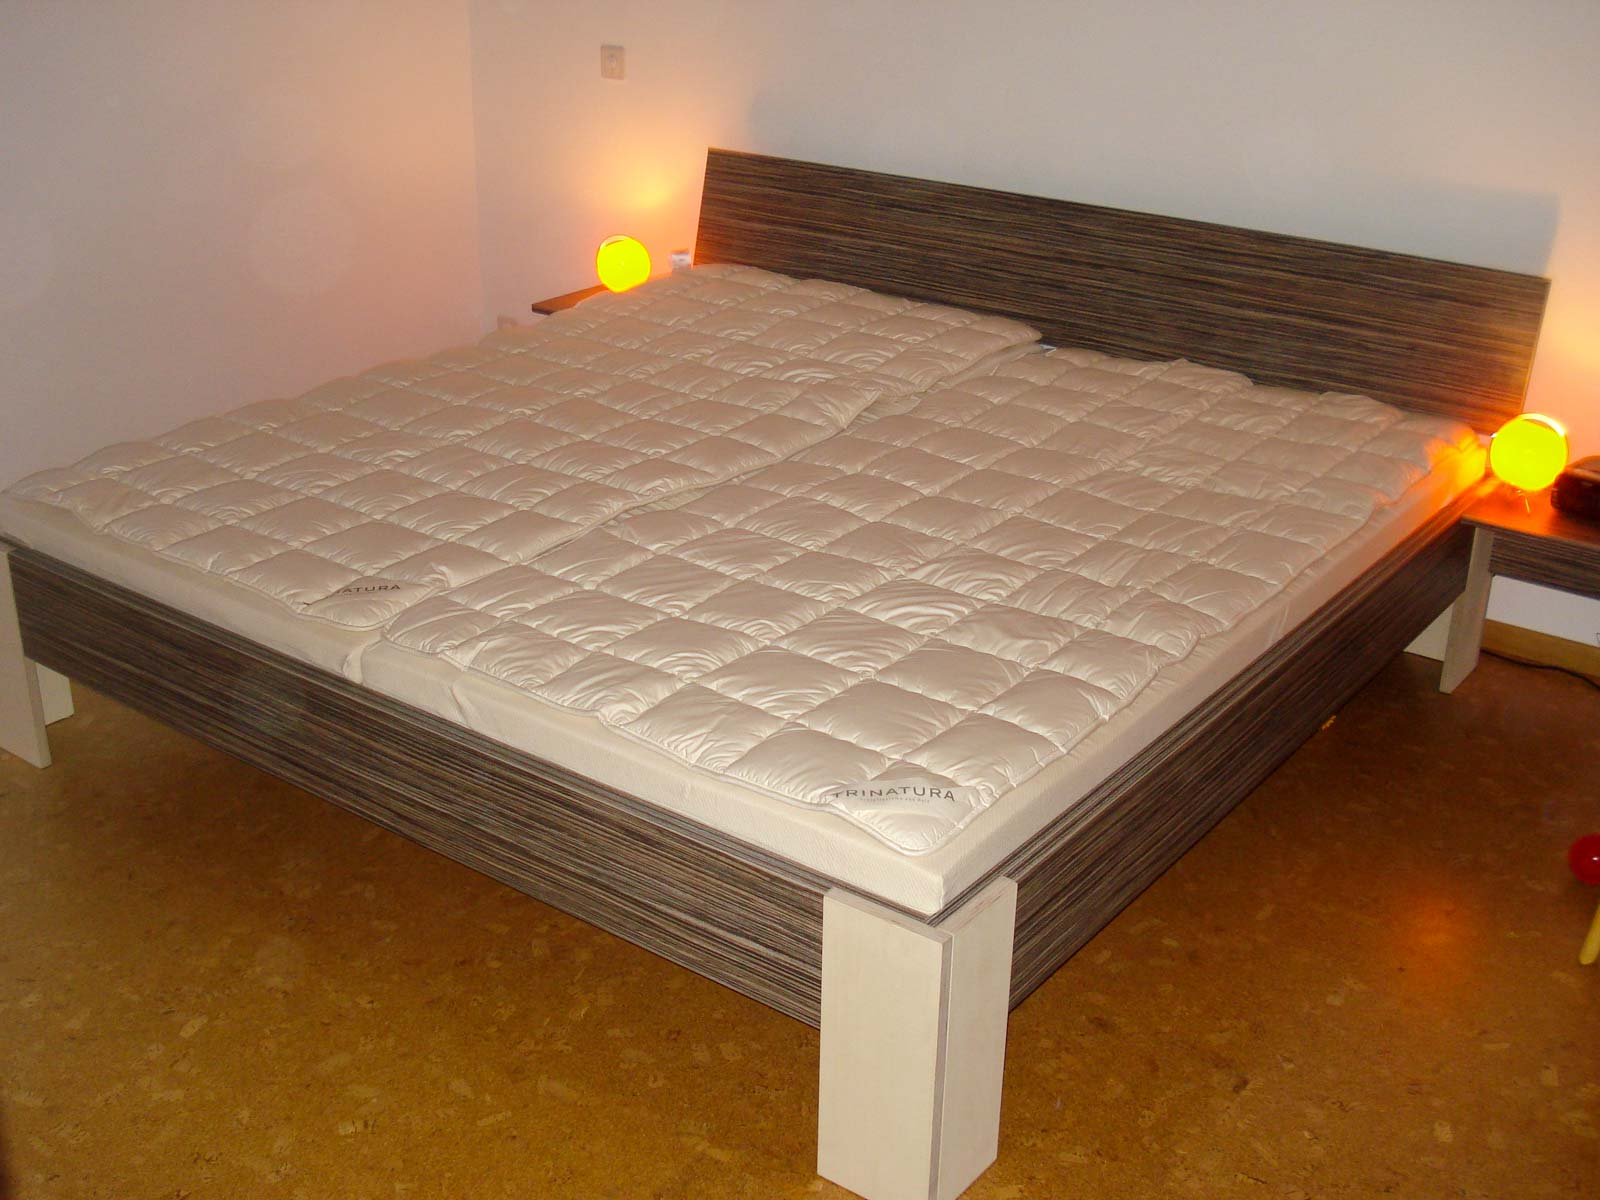 Wooddesign_Bett_Trinatura_Testbett_dunkel_Doppelbett (2)